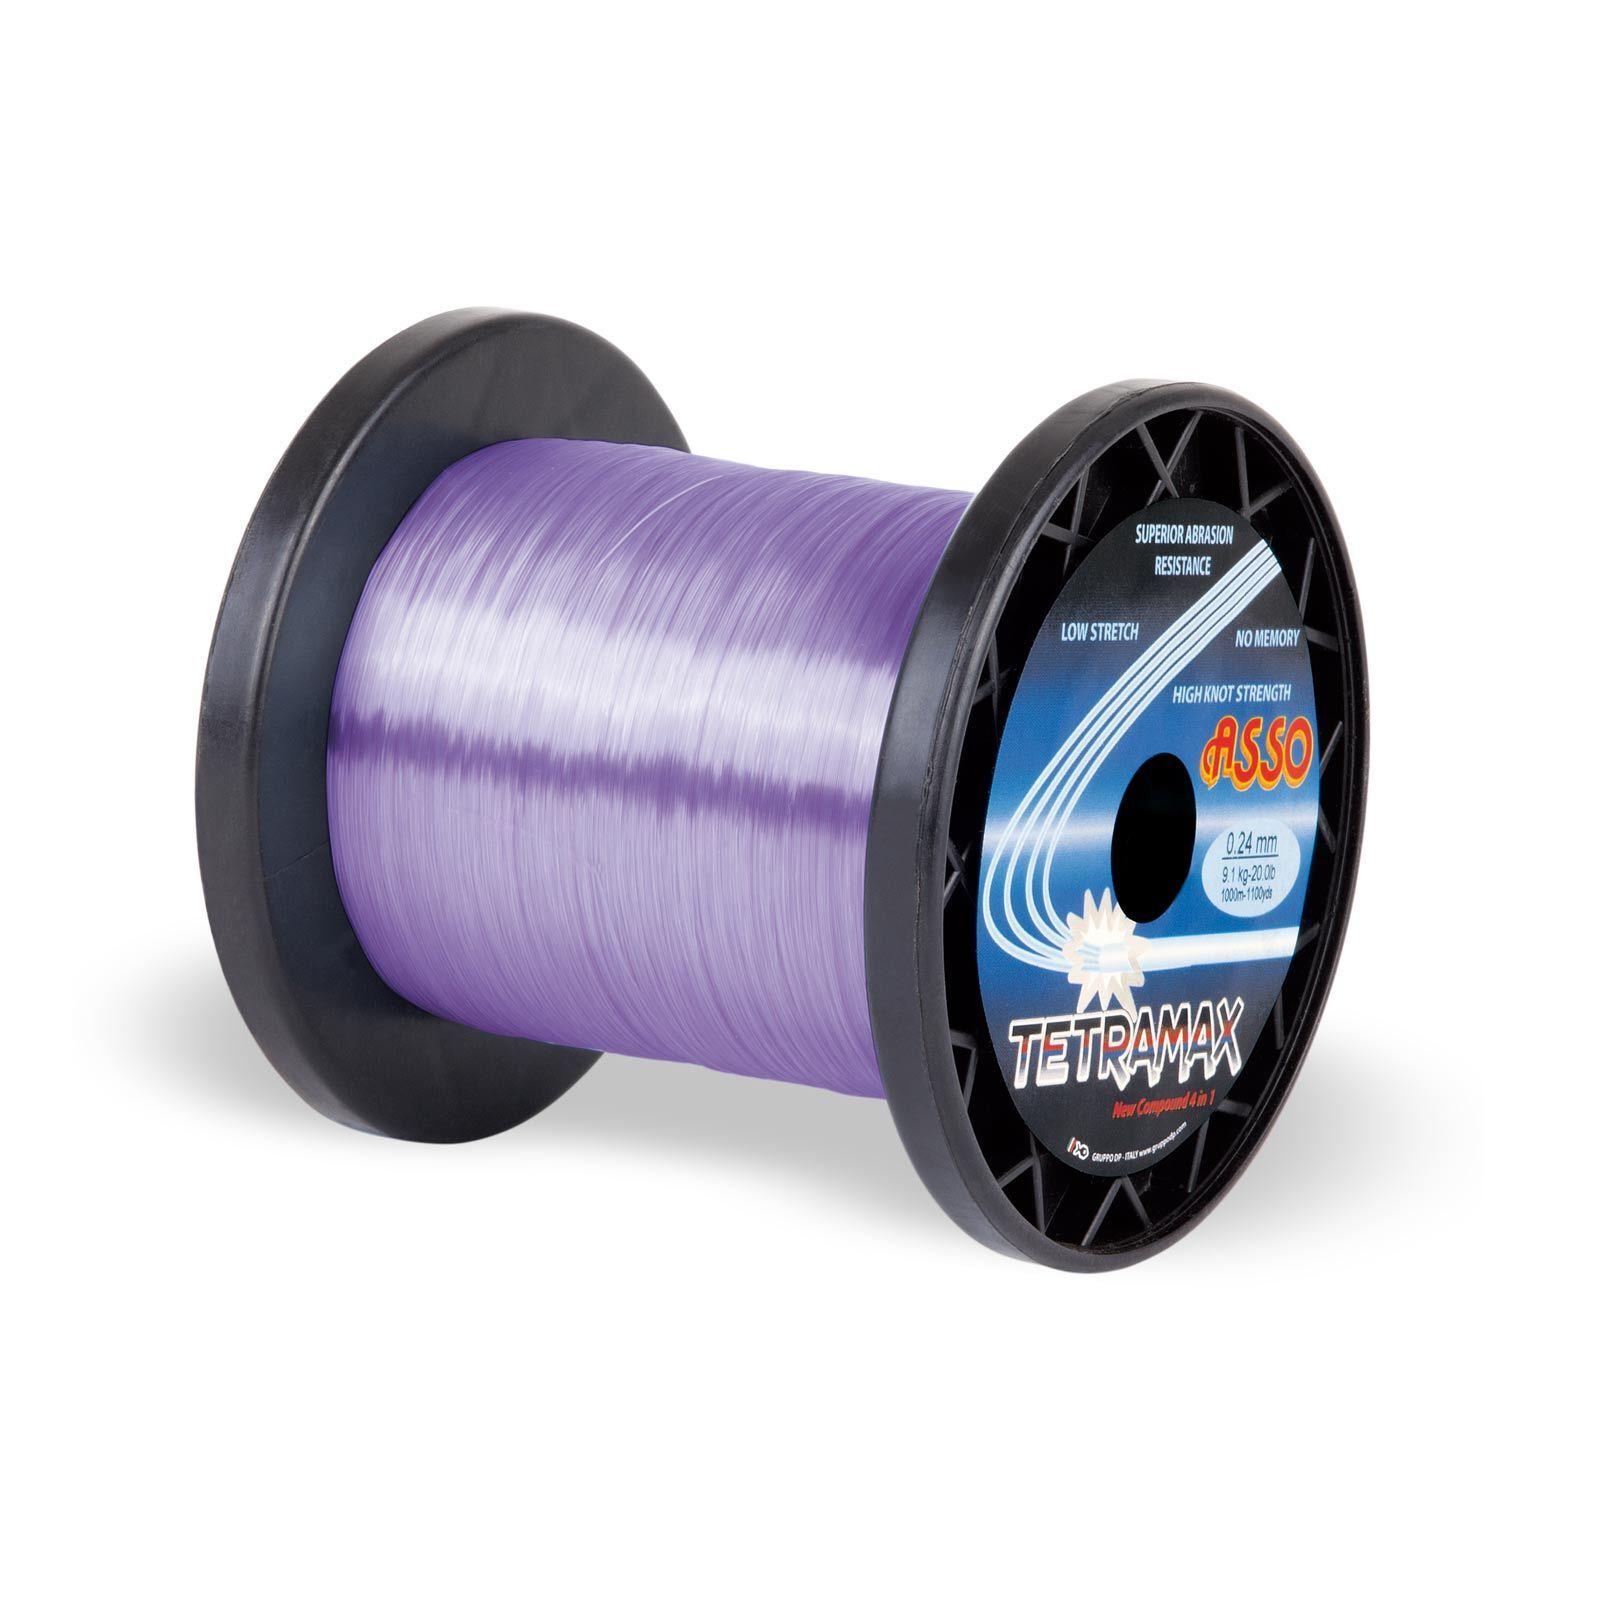 (0,05EUR m) ASSO Monofile Angelschnur Tetramax Mono 1000m 0,35mm 8,50 kg Purple